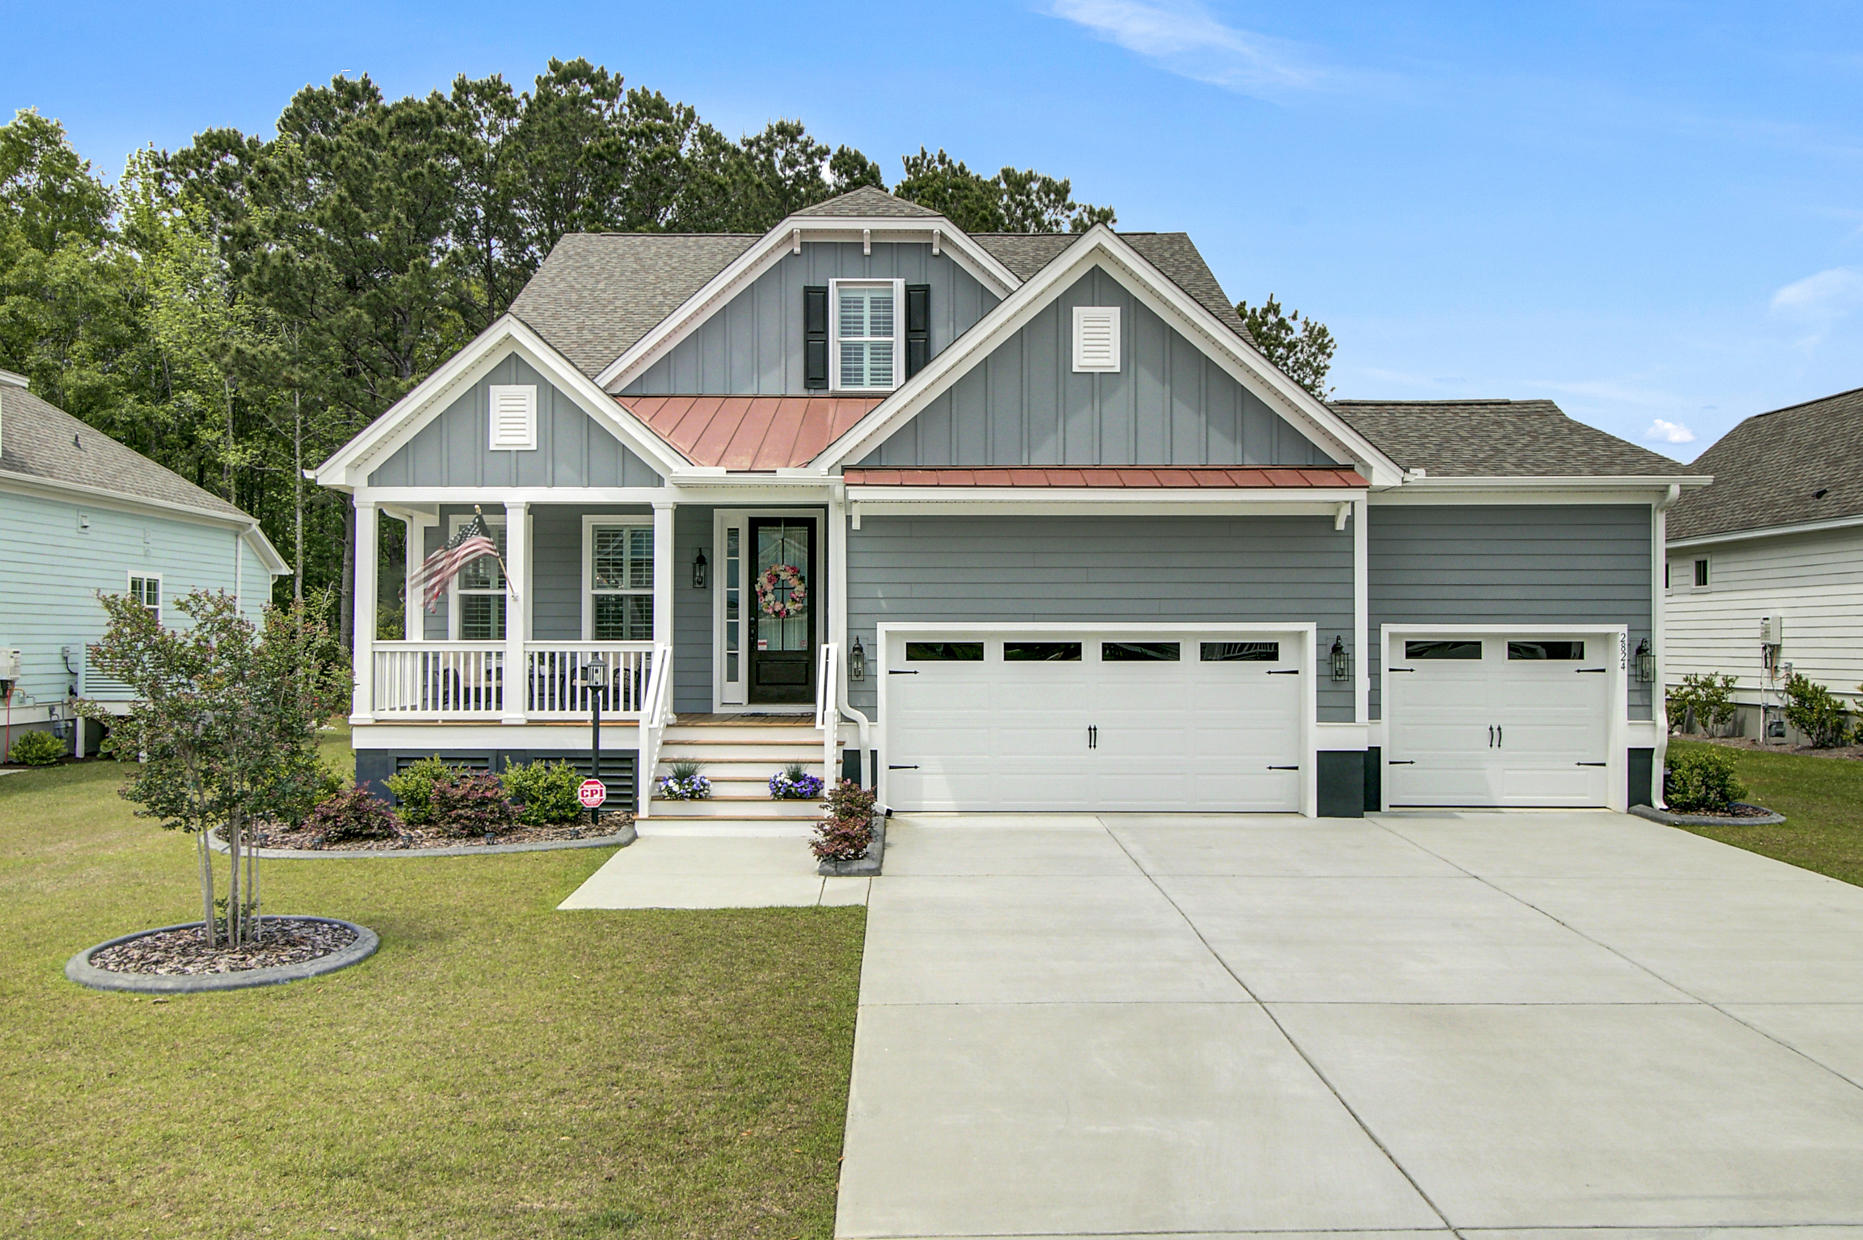 Park West Homes For Sale - 2824 Wagner, Mount Pleasant, SC - 6